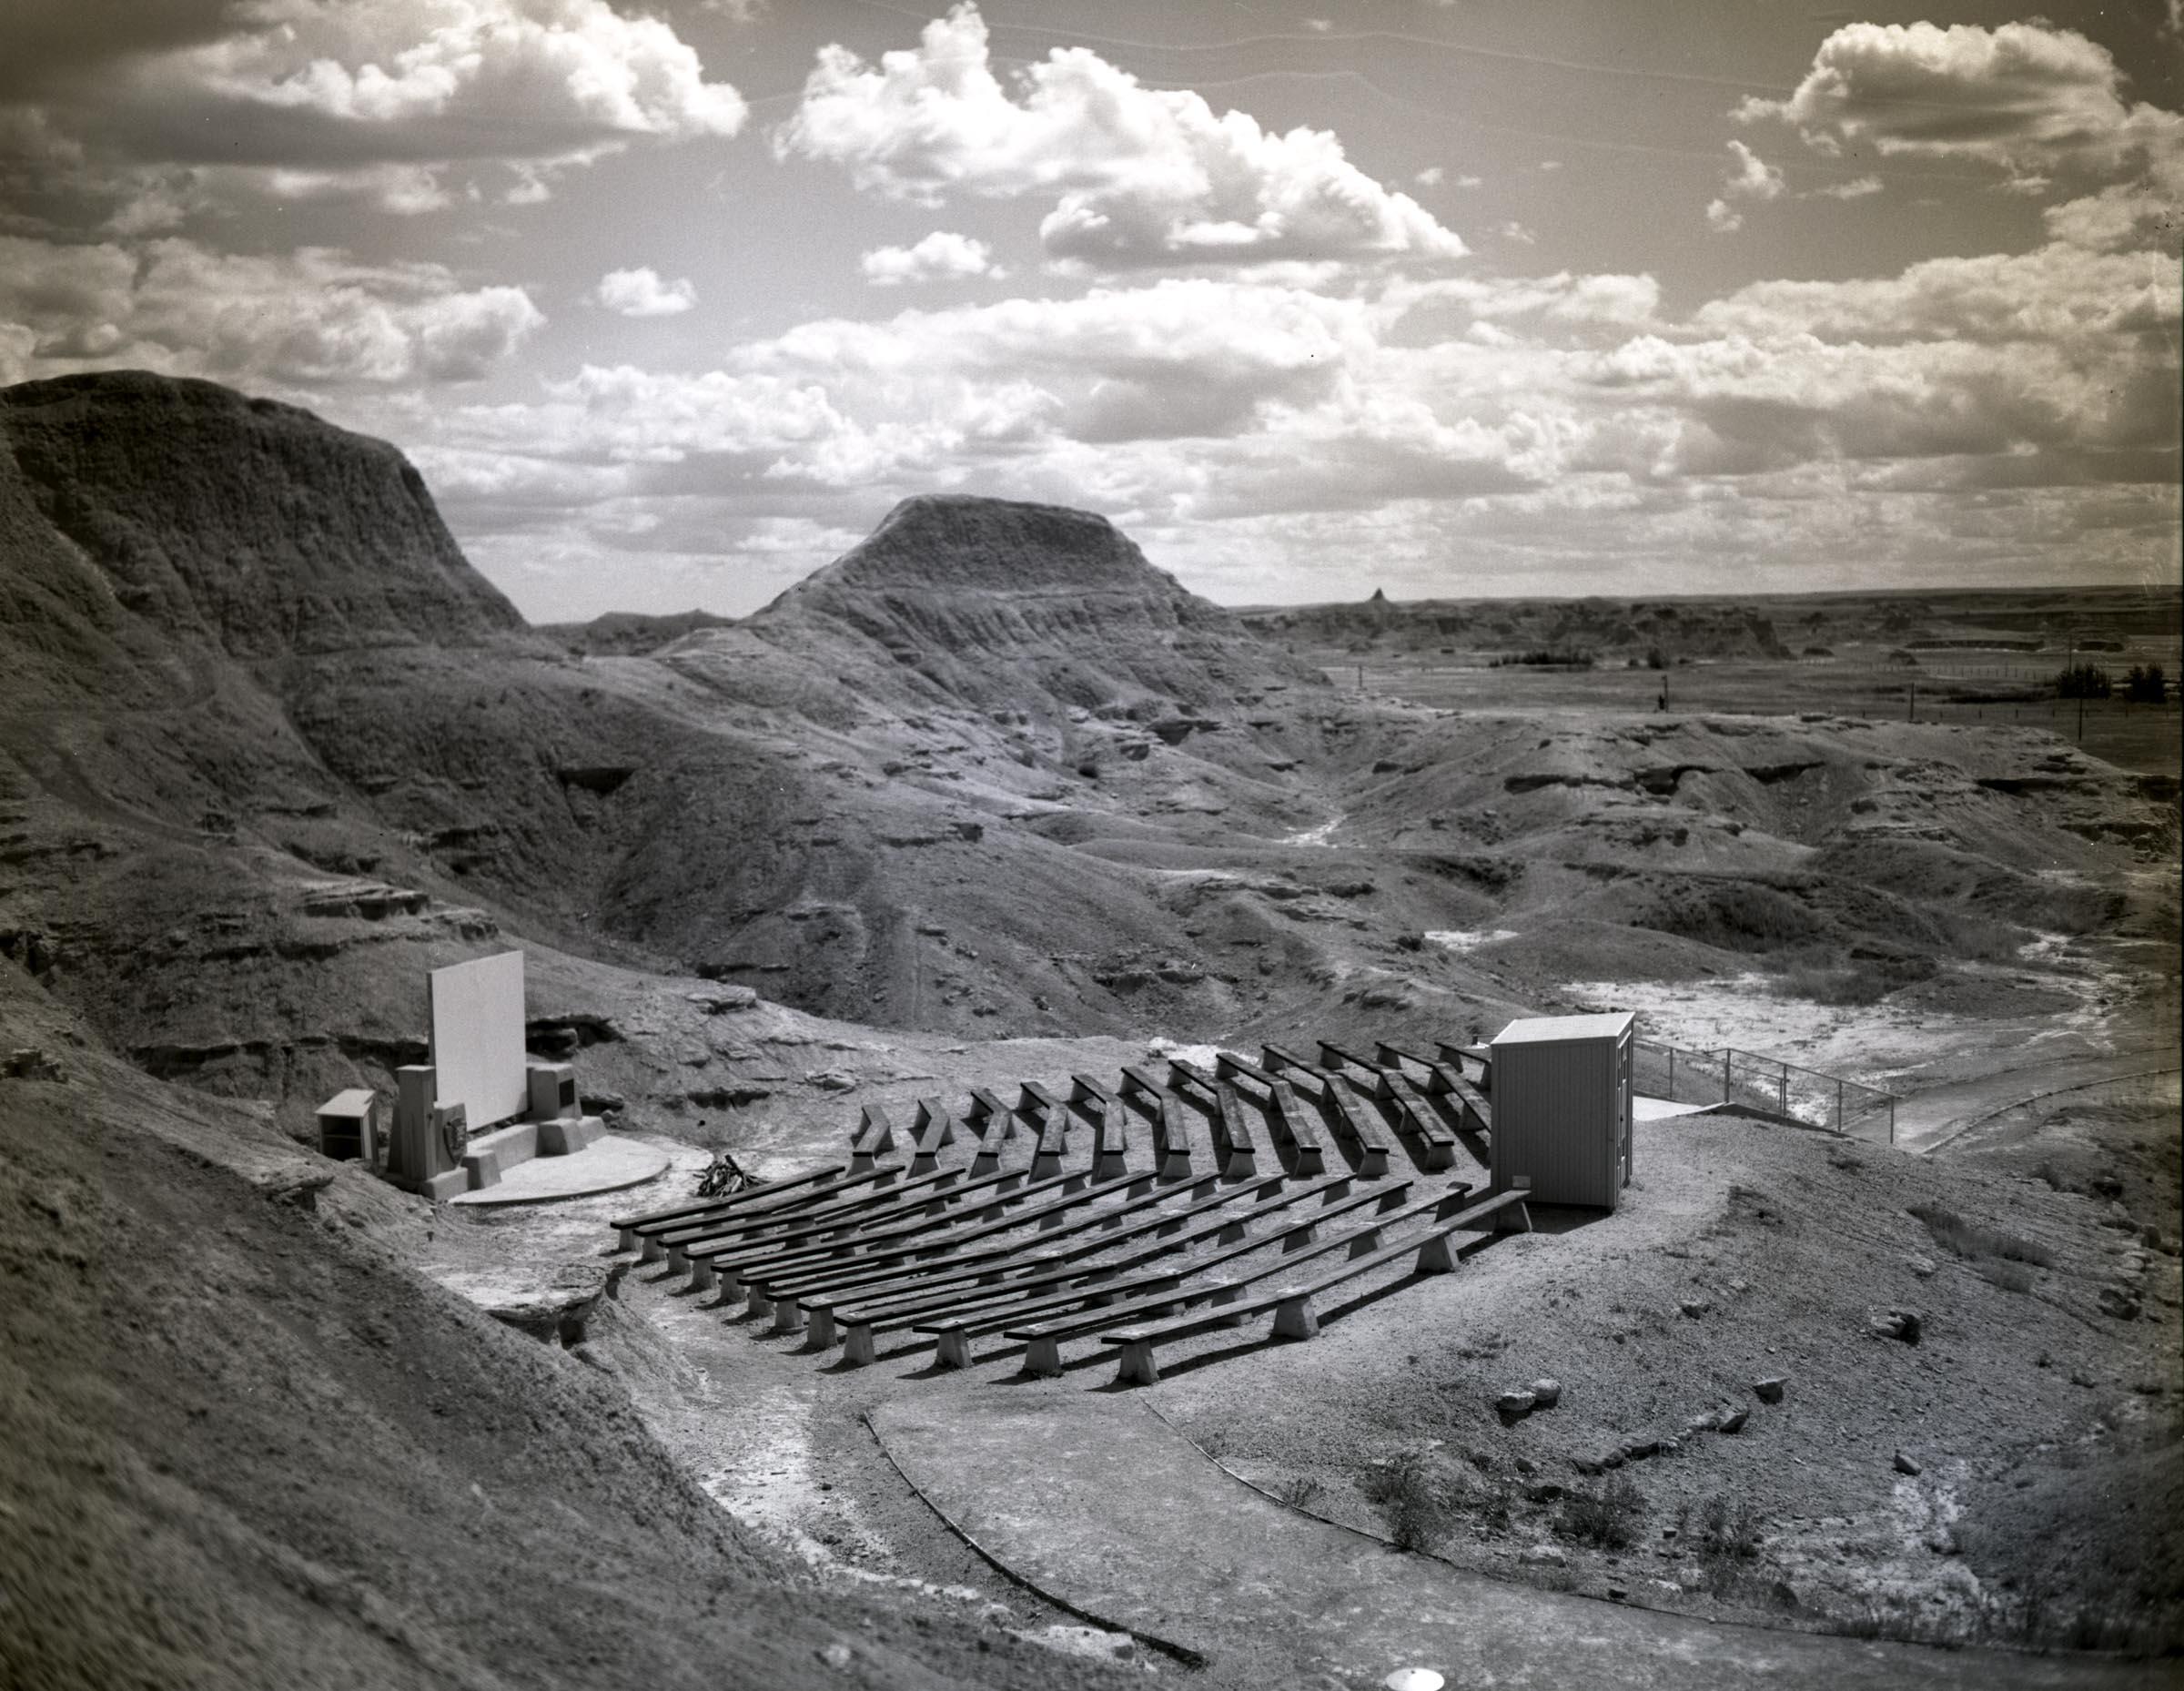 BADL2497a-CampgroundAmphitheater_1968-jpg634346690302865214.jpg